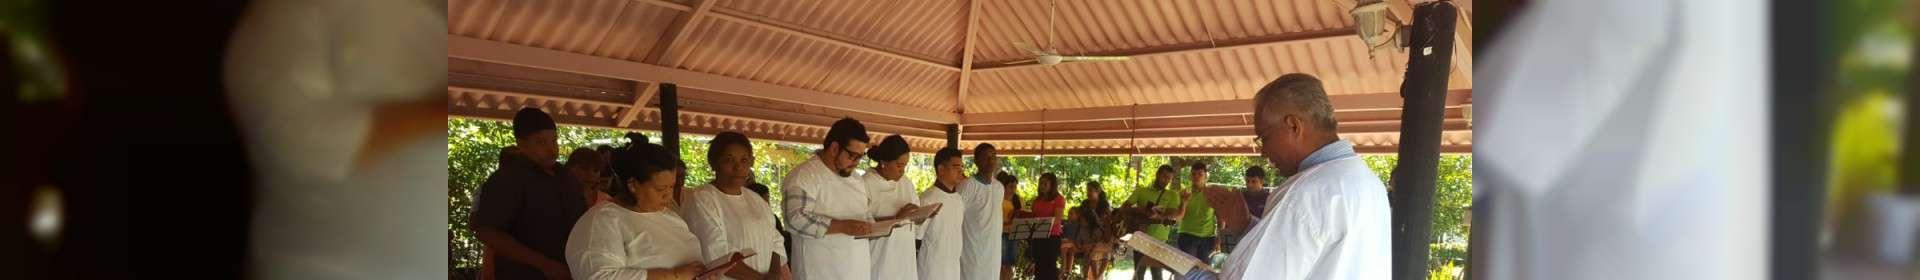 Membros da Igreja Cristã Maranata de Aguadulce, Panamá, participam de batismo